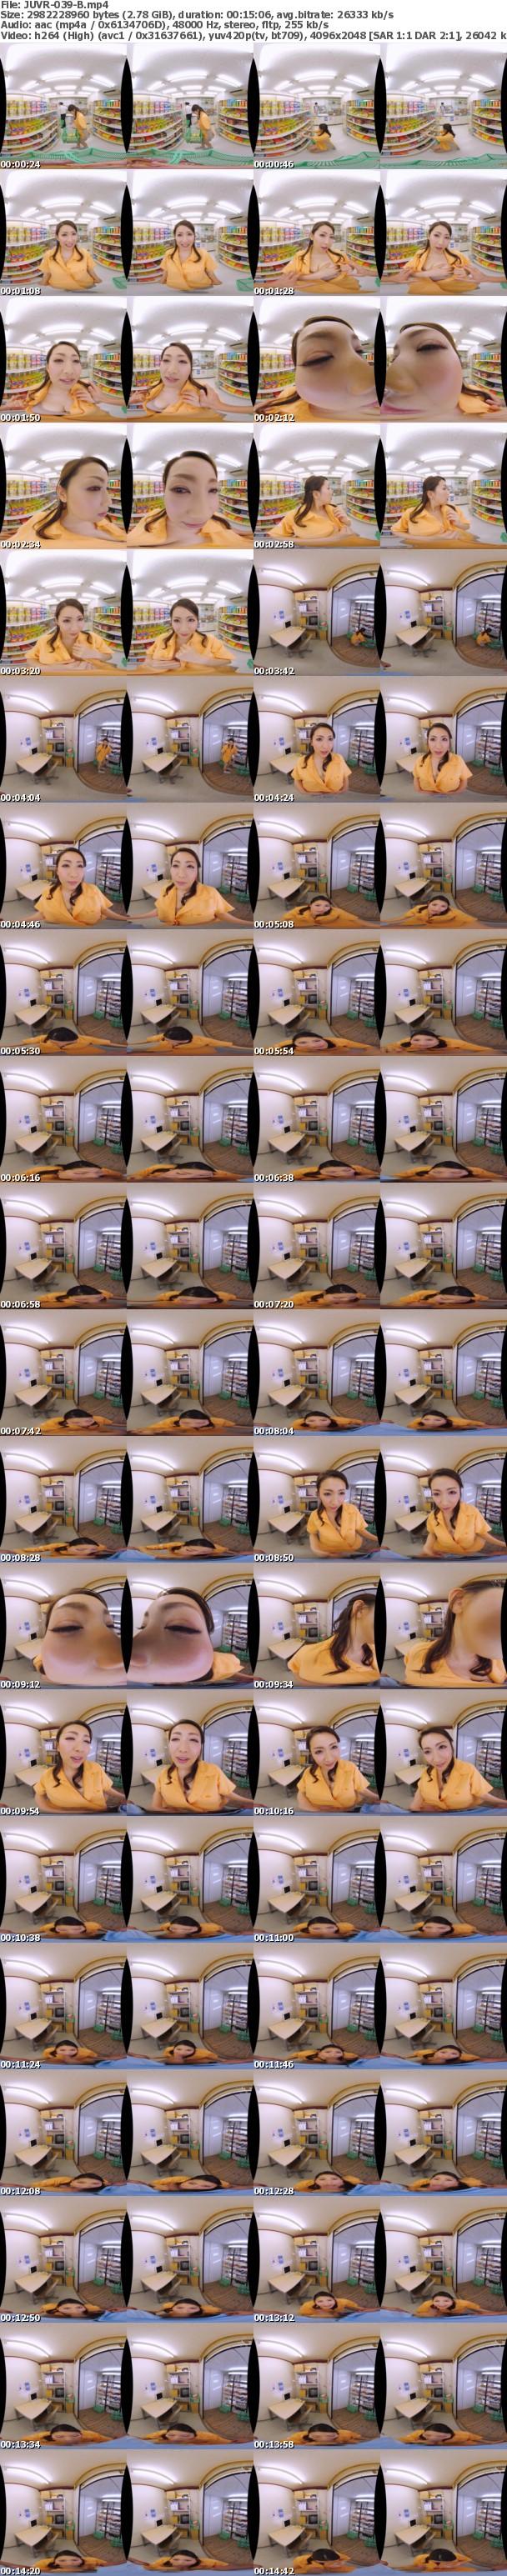 (VR) JUVR-039 初VR!!マドンナ専属 妃ひかり バイトの休憩中に店長の奥さんと2人きり!童貞の僕をずっと見つめながら優しく導いてくれる筆下ろしVR